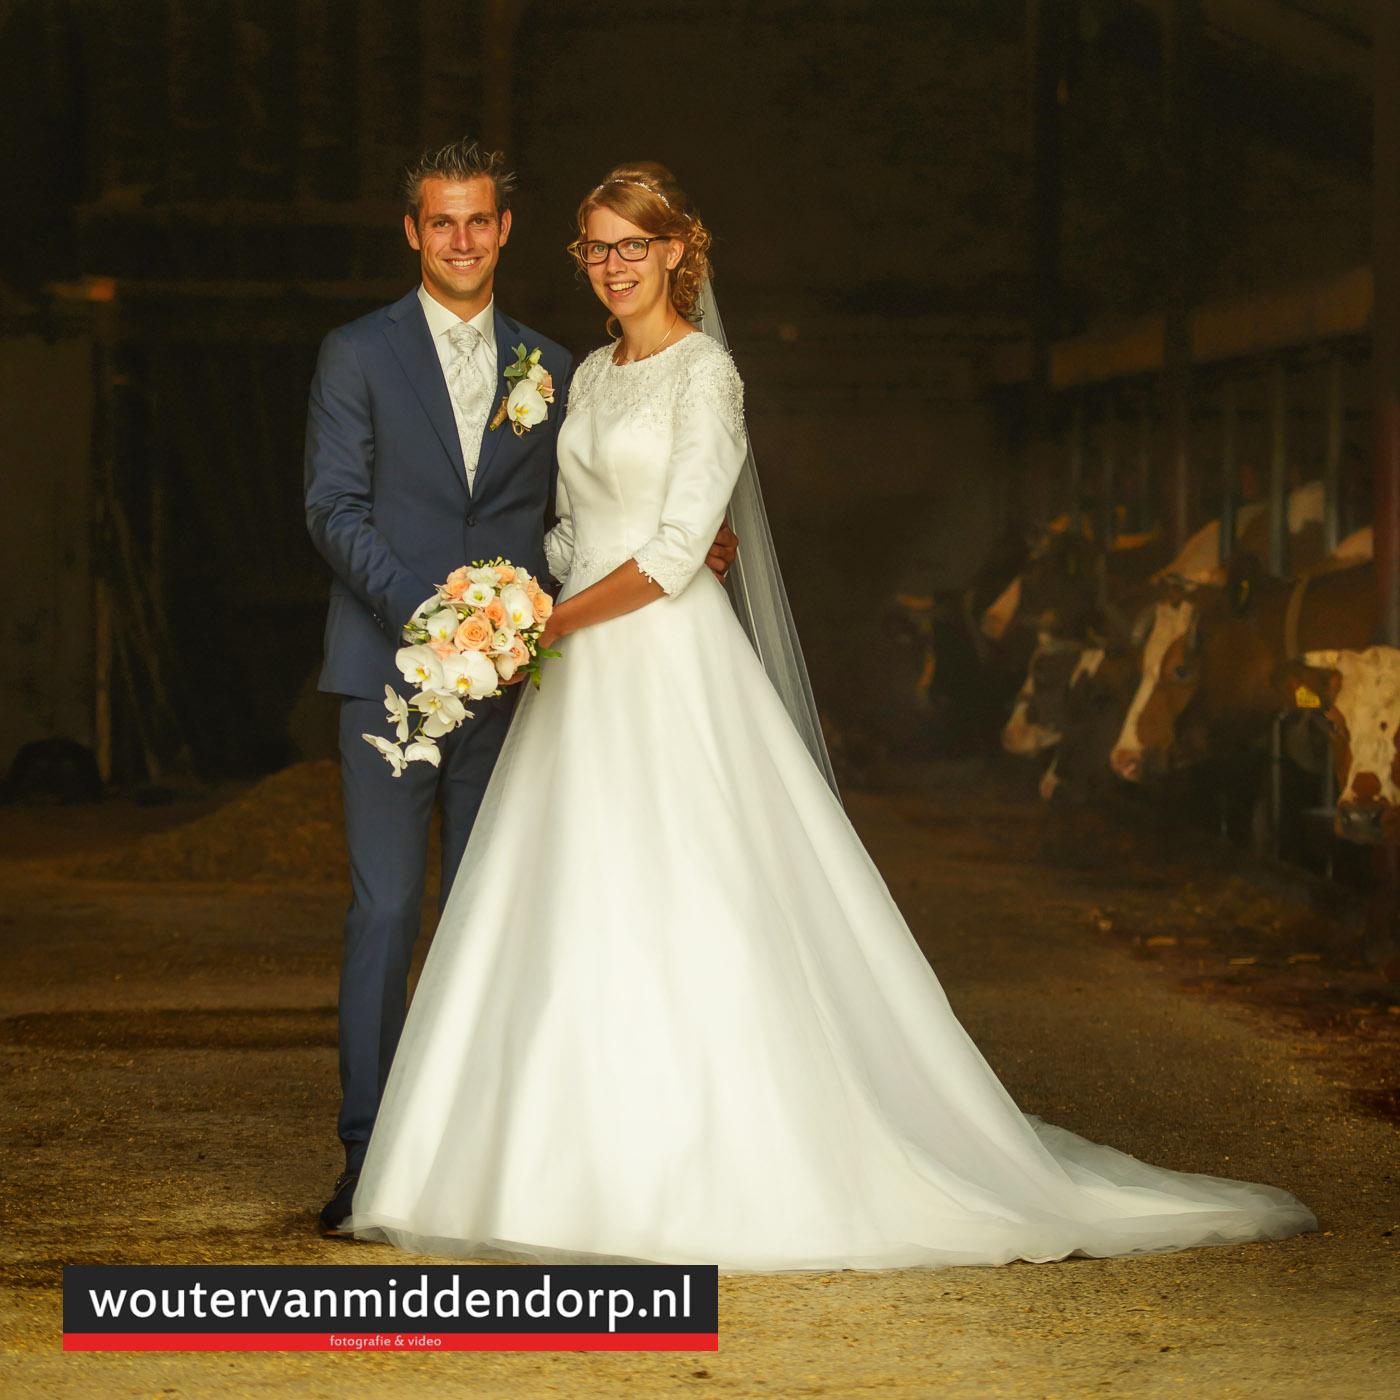 bruidsfotografie Wouter van Middendorp Uddel HArskamp Barneveld-13